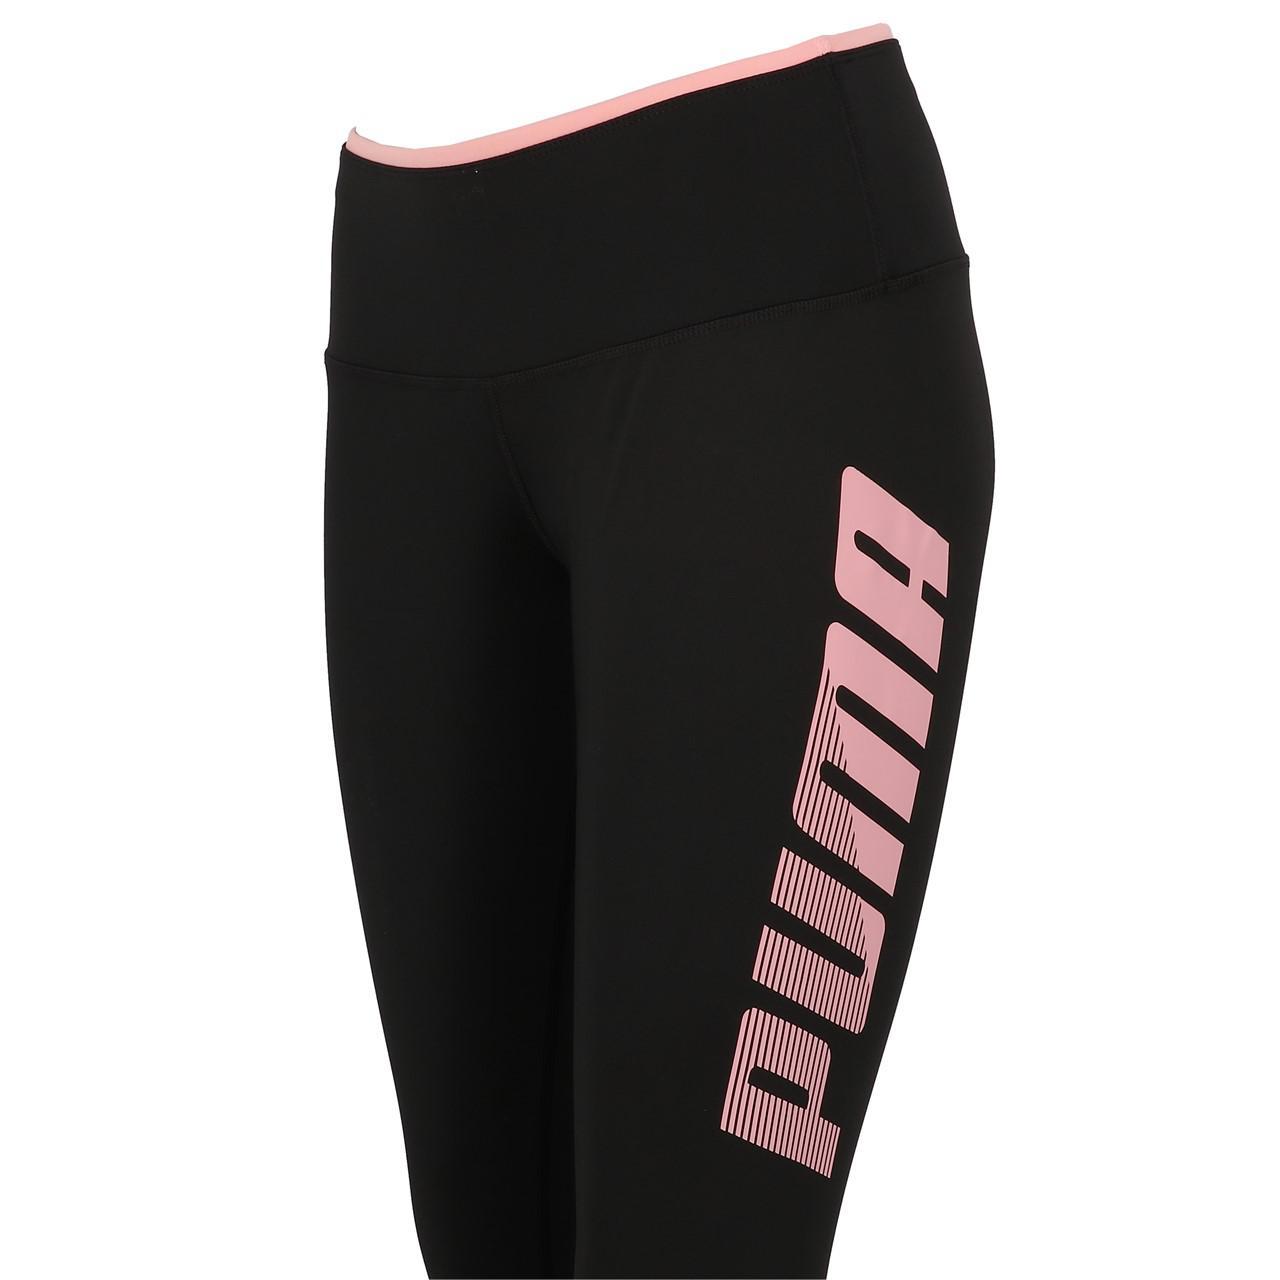 Legging-Sport-Puma-Modern-Sport-Leggings-Blk-Schwarz-19725-Neu Indexbild 3